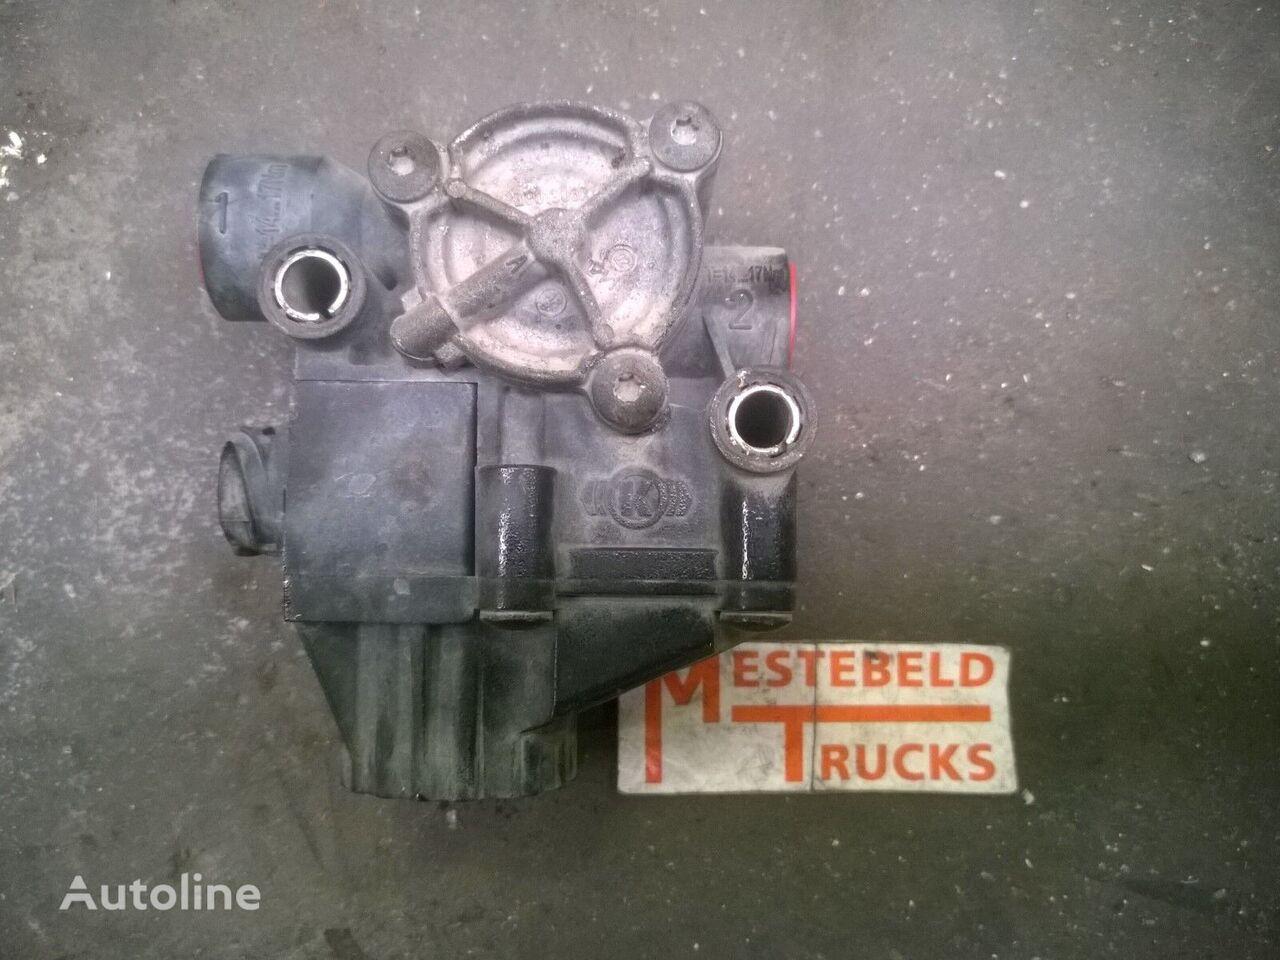 ABS magneetventiel supapă pentru MAN ABS magneetventiel L2000 camion